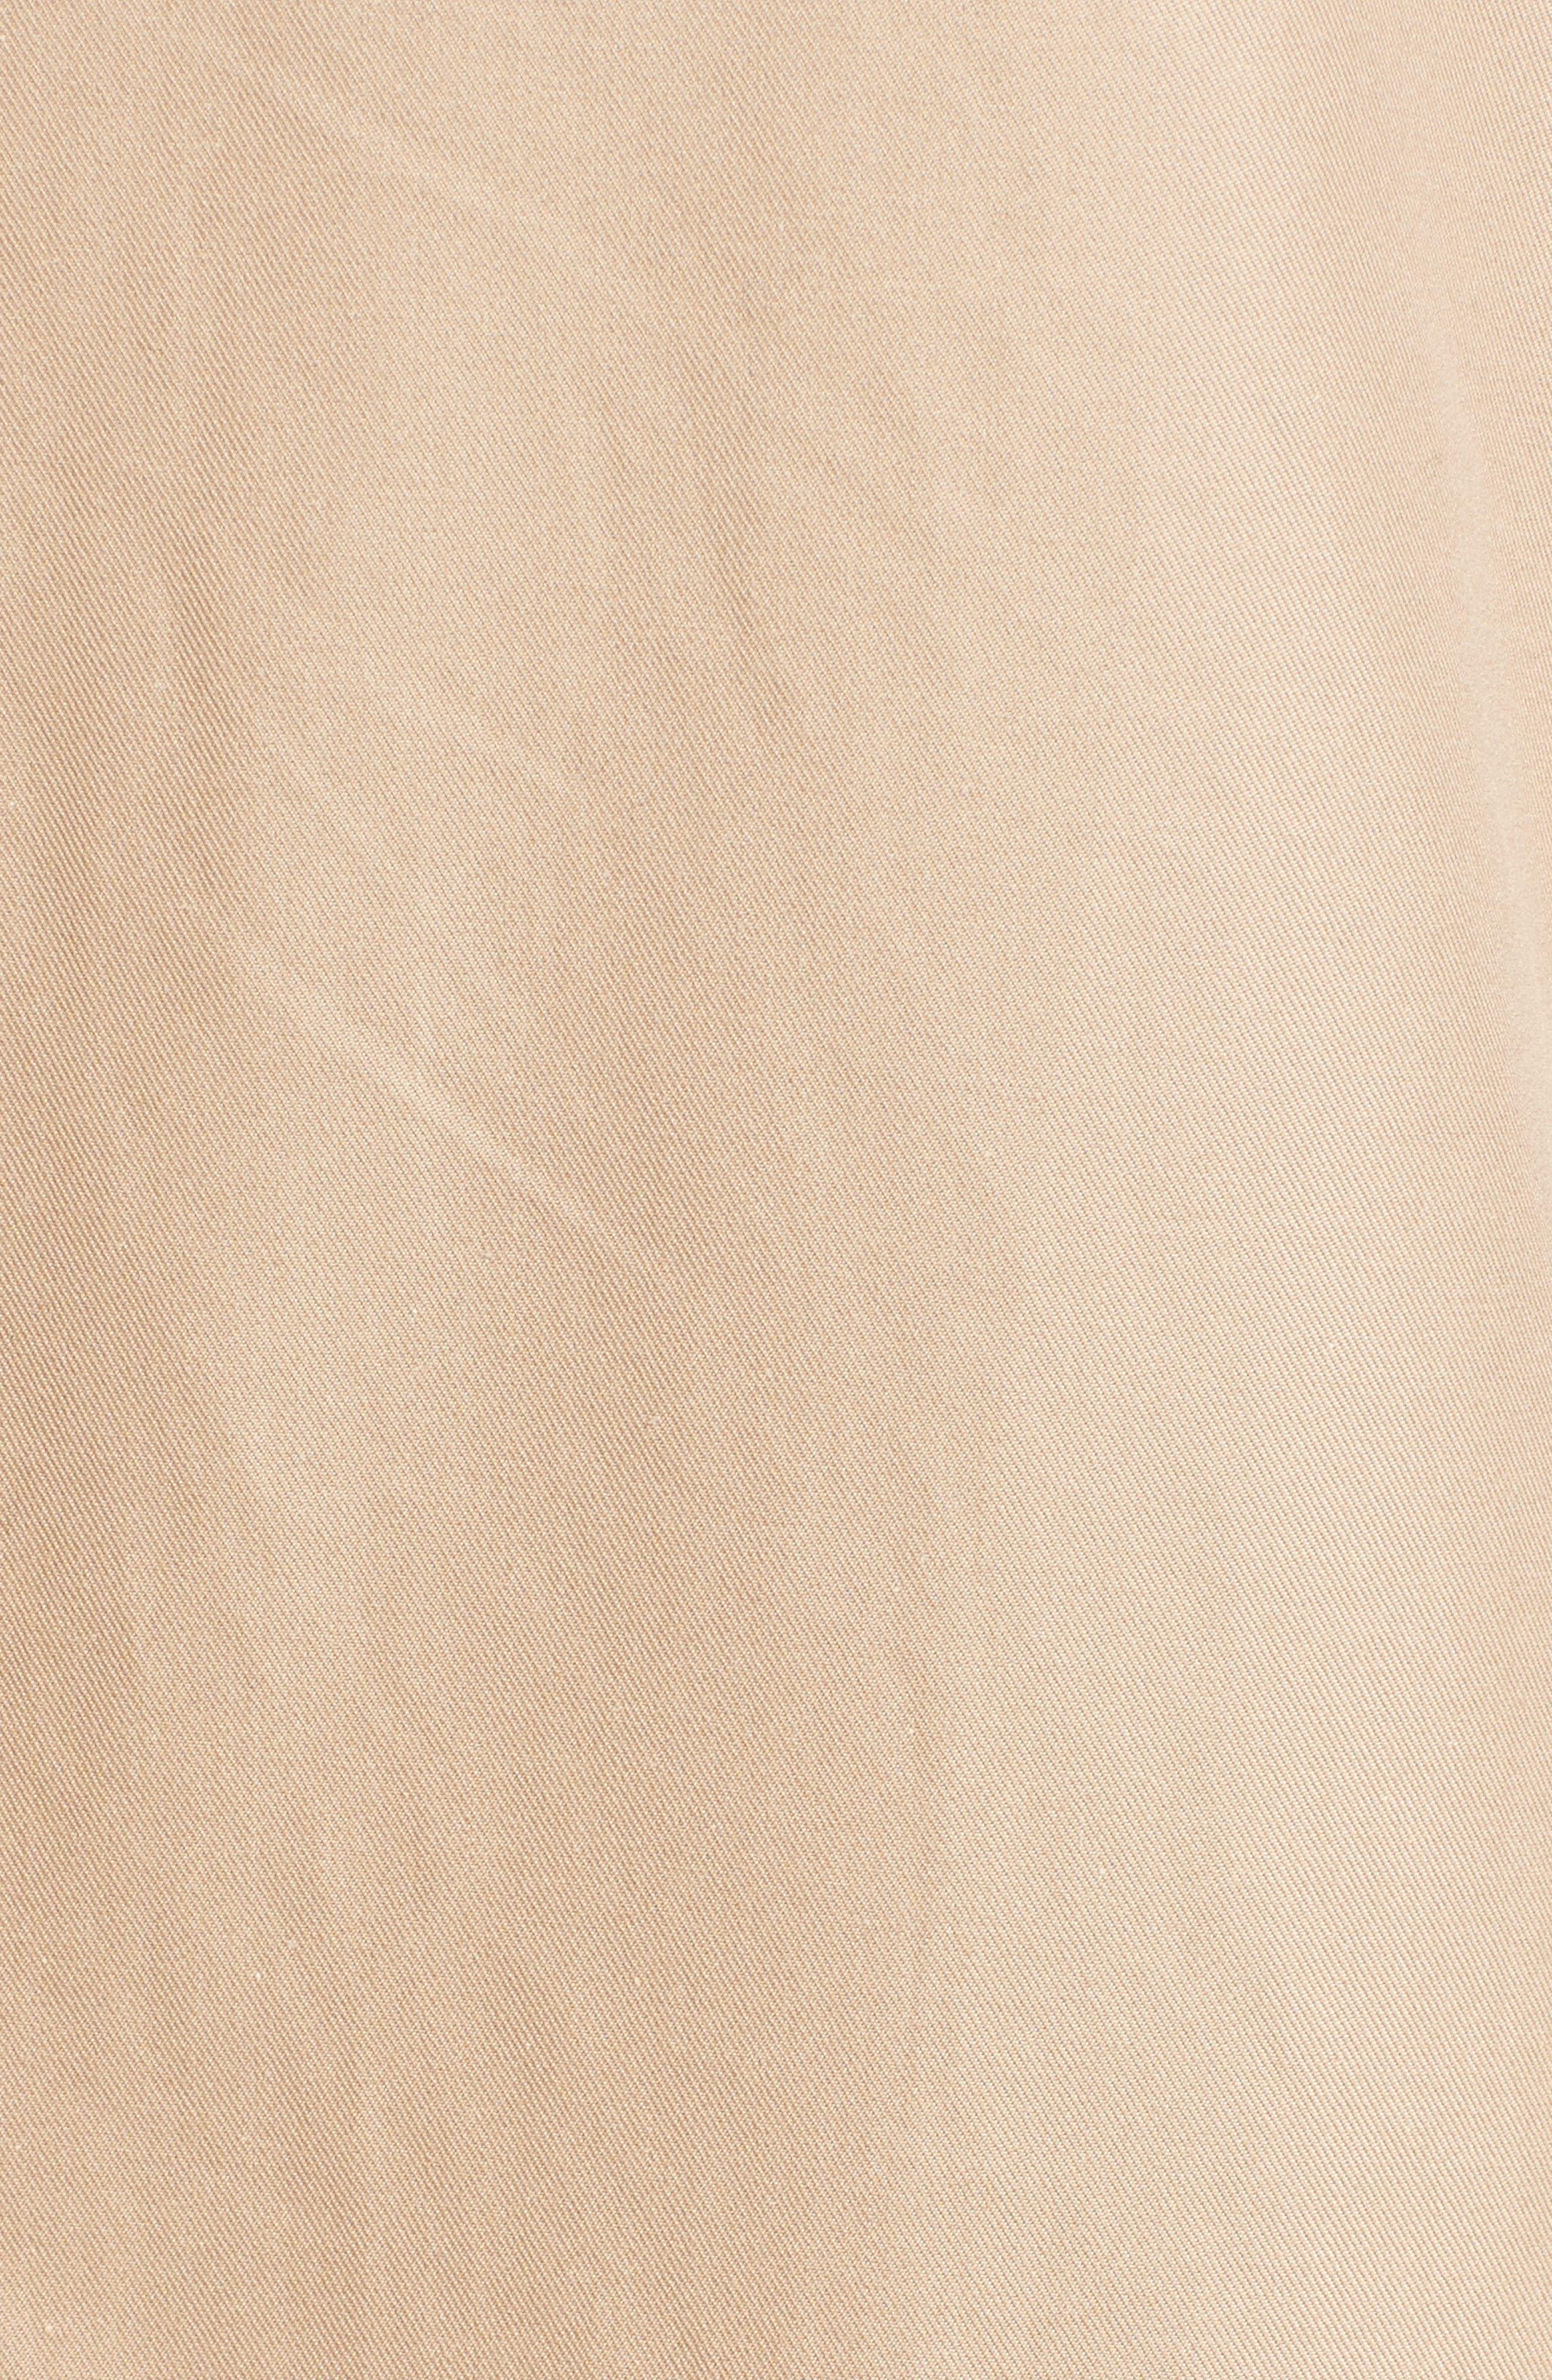 Alternate Image 3  - A.W.A.K.E. Oversized Cotton Trench Coat